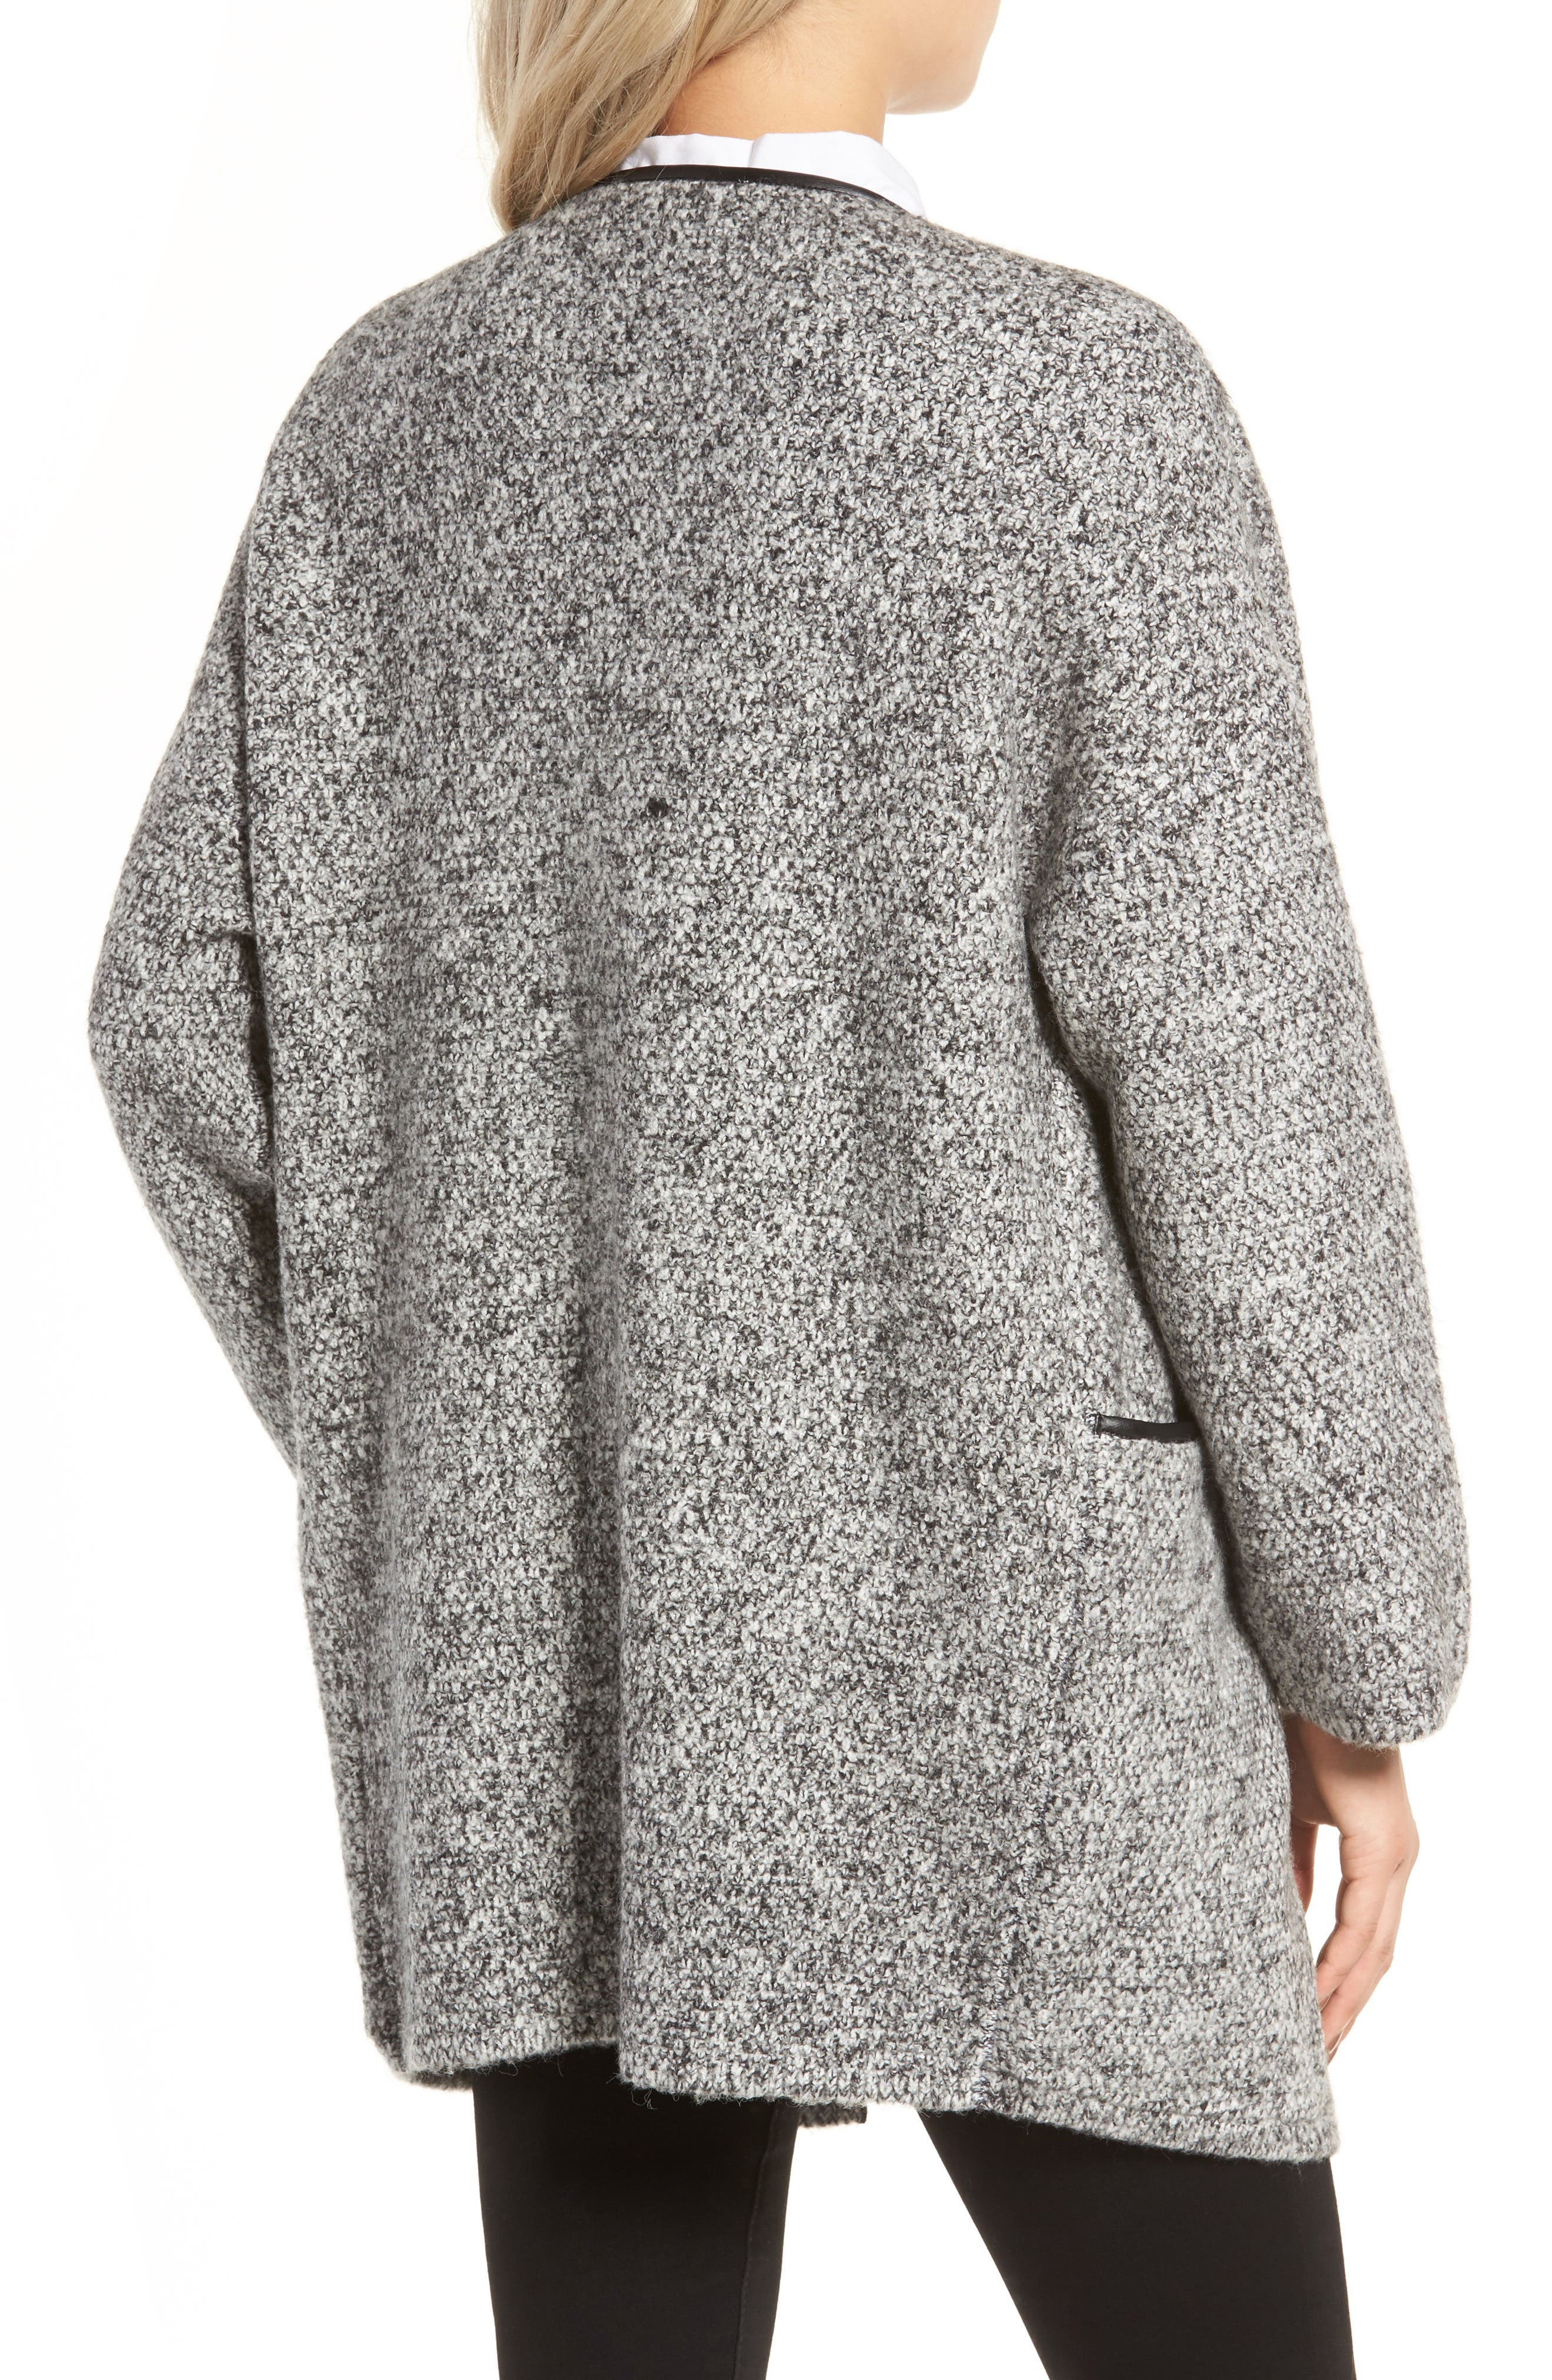 ASTR THE LABEL,                             ASTR Drape Front Sweater Jacket,                             Alternate thumbnail 2, color,                             001